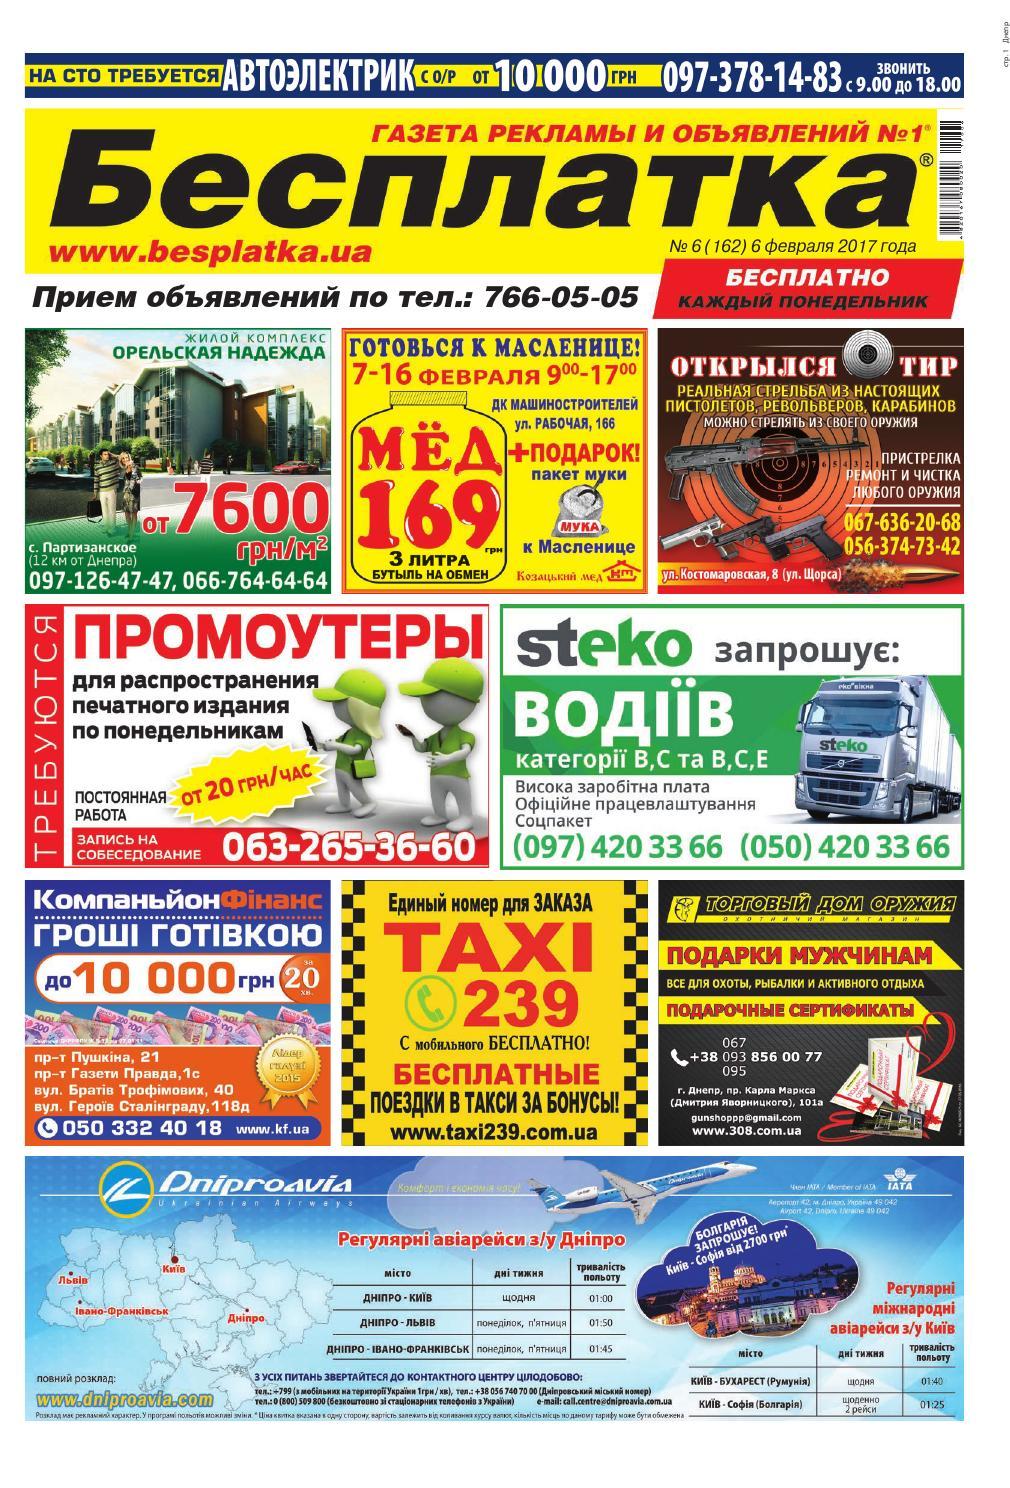 aa2a29696b3aa Besplatka #6 Днепр by besplatka ukraine - issuu